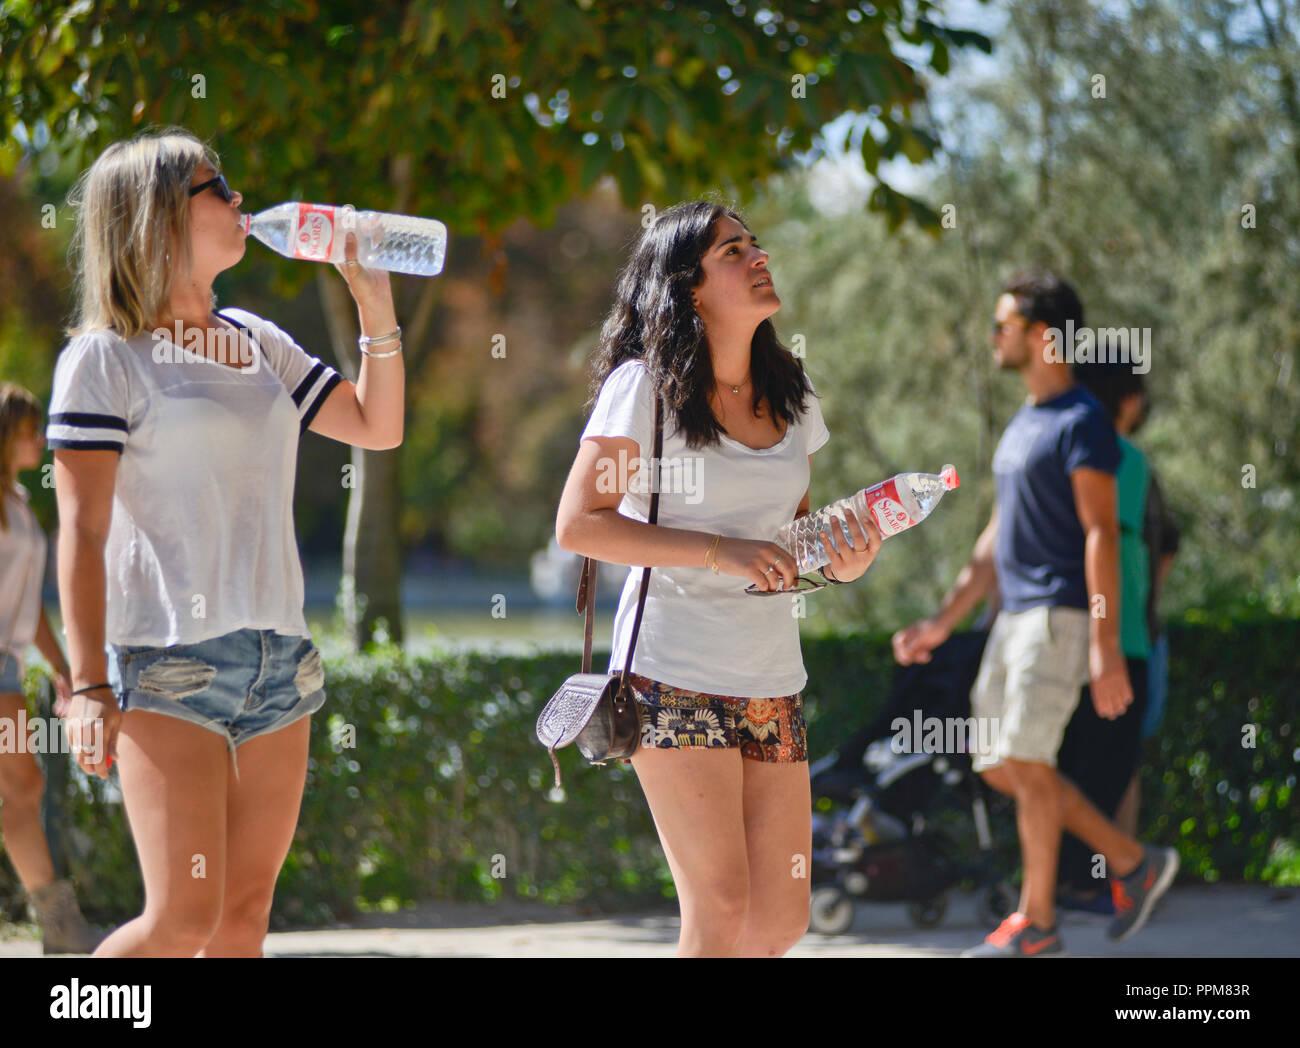 Tourists drinking water during summer. Buen Retiro Park - Parque del Buen Retiro, Madrid, Spain - Stock Image